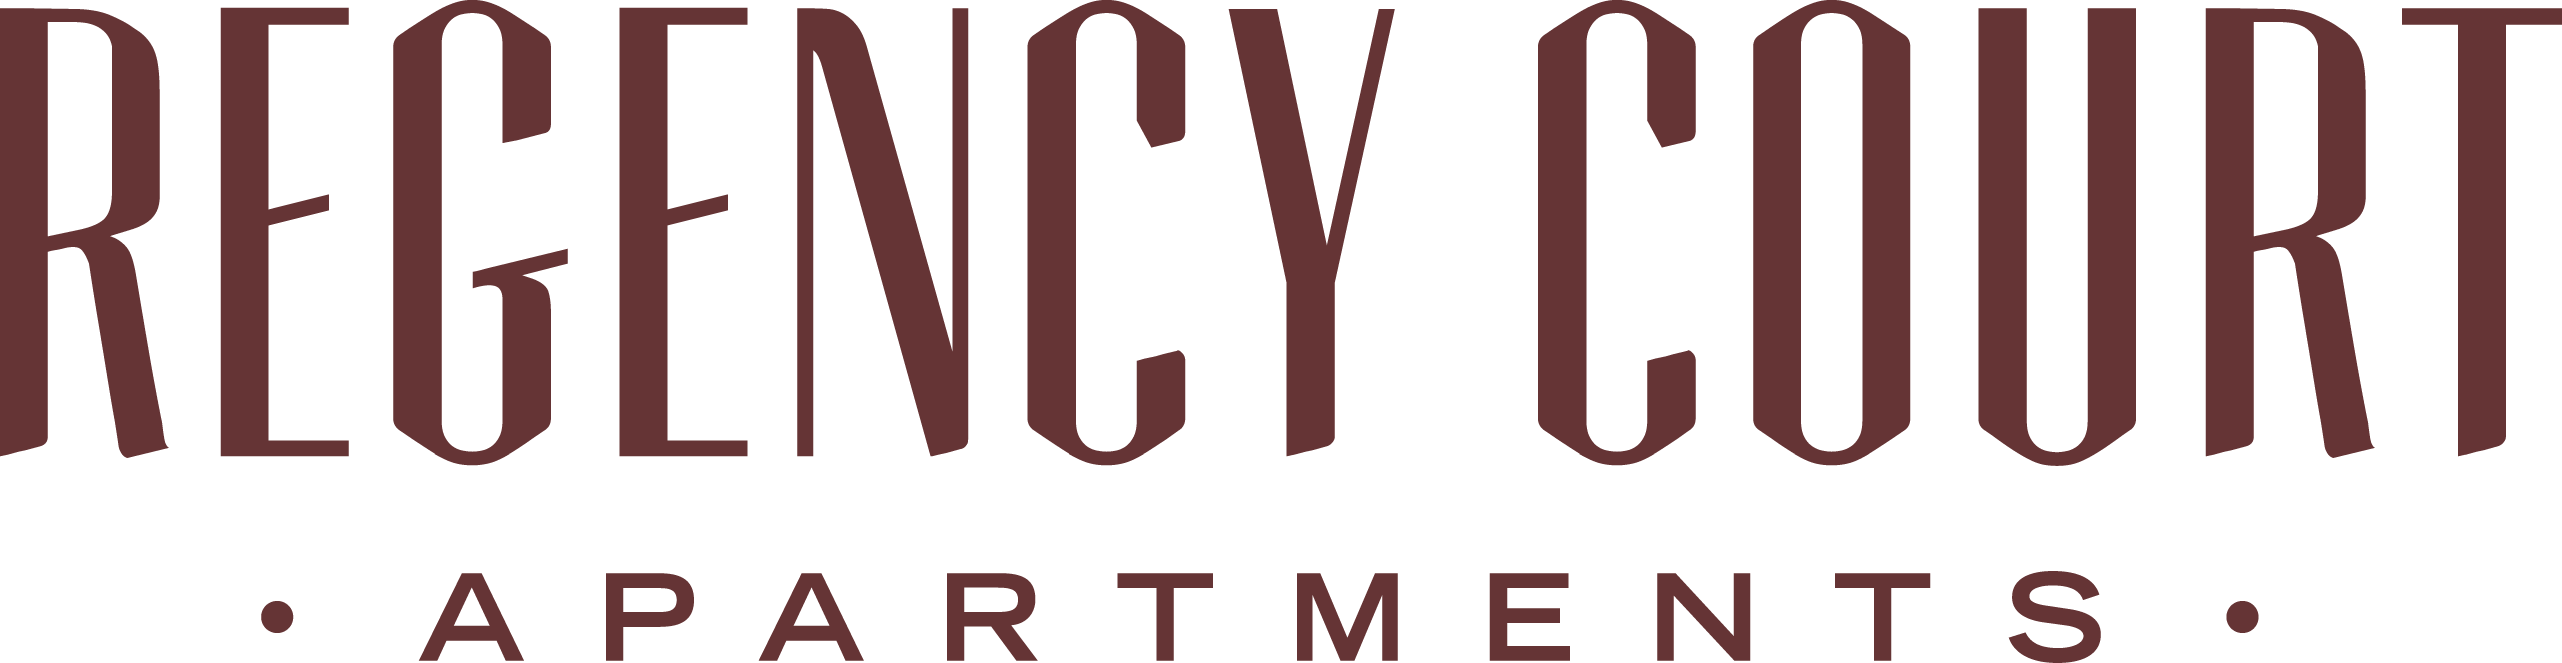 Regency - Regency Court Apartments - Branding